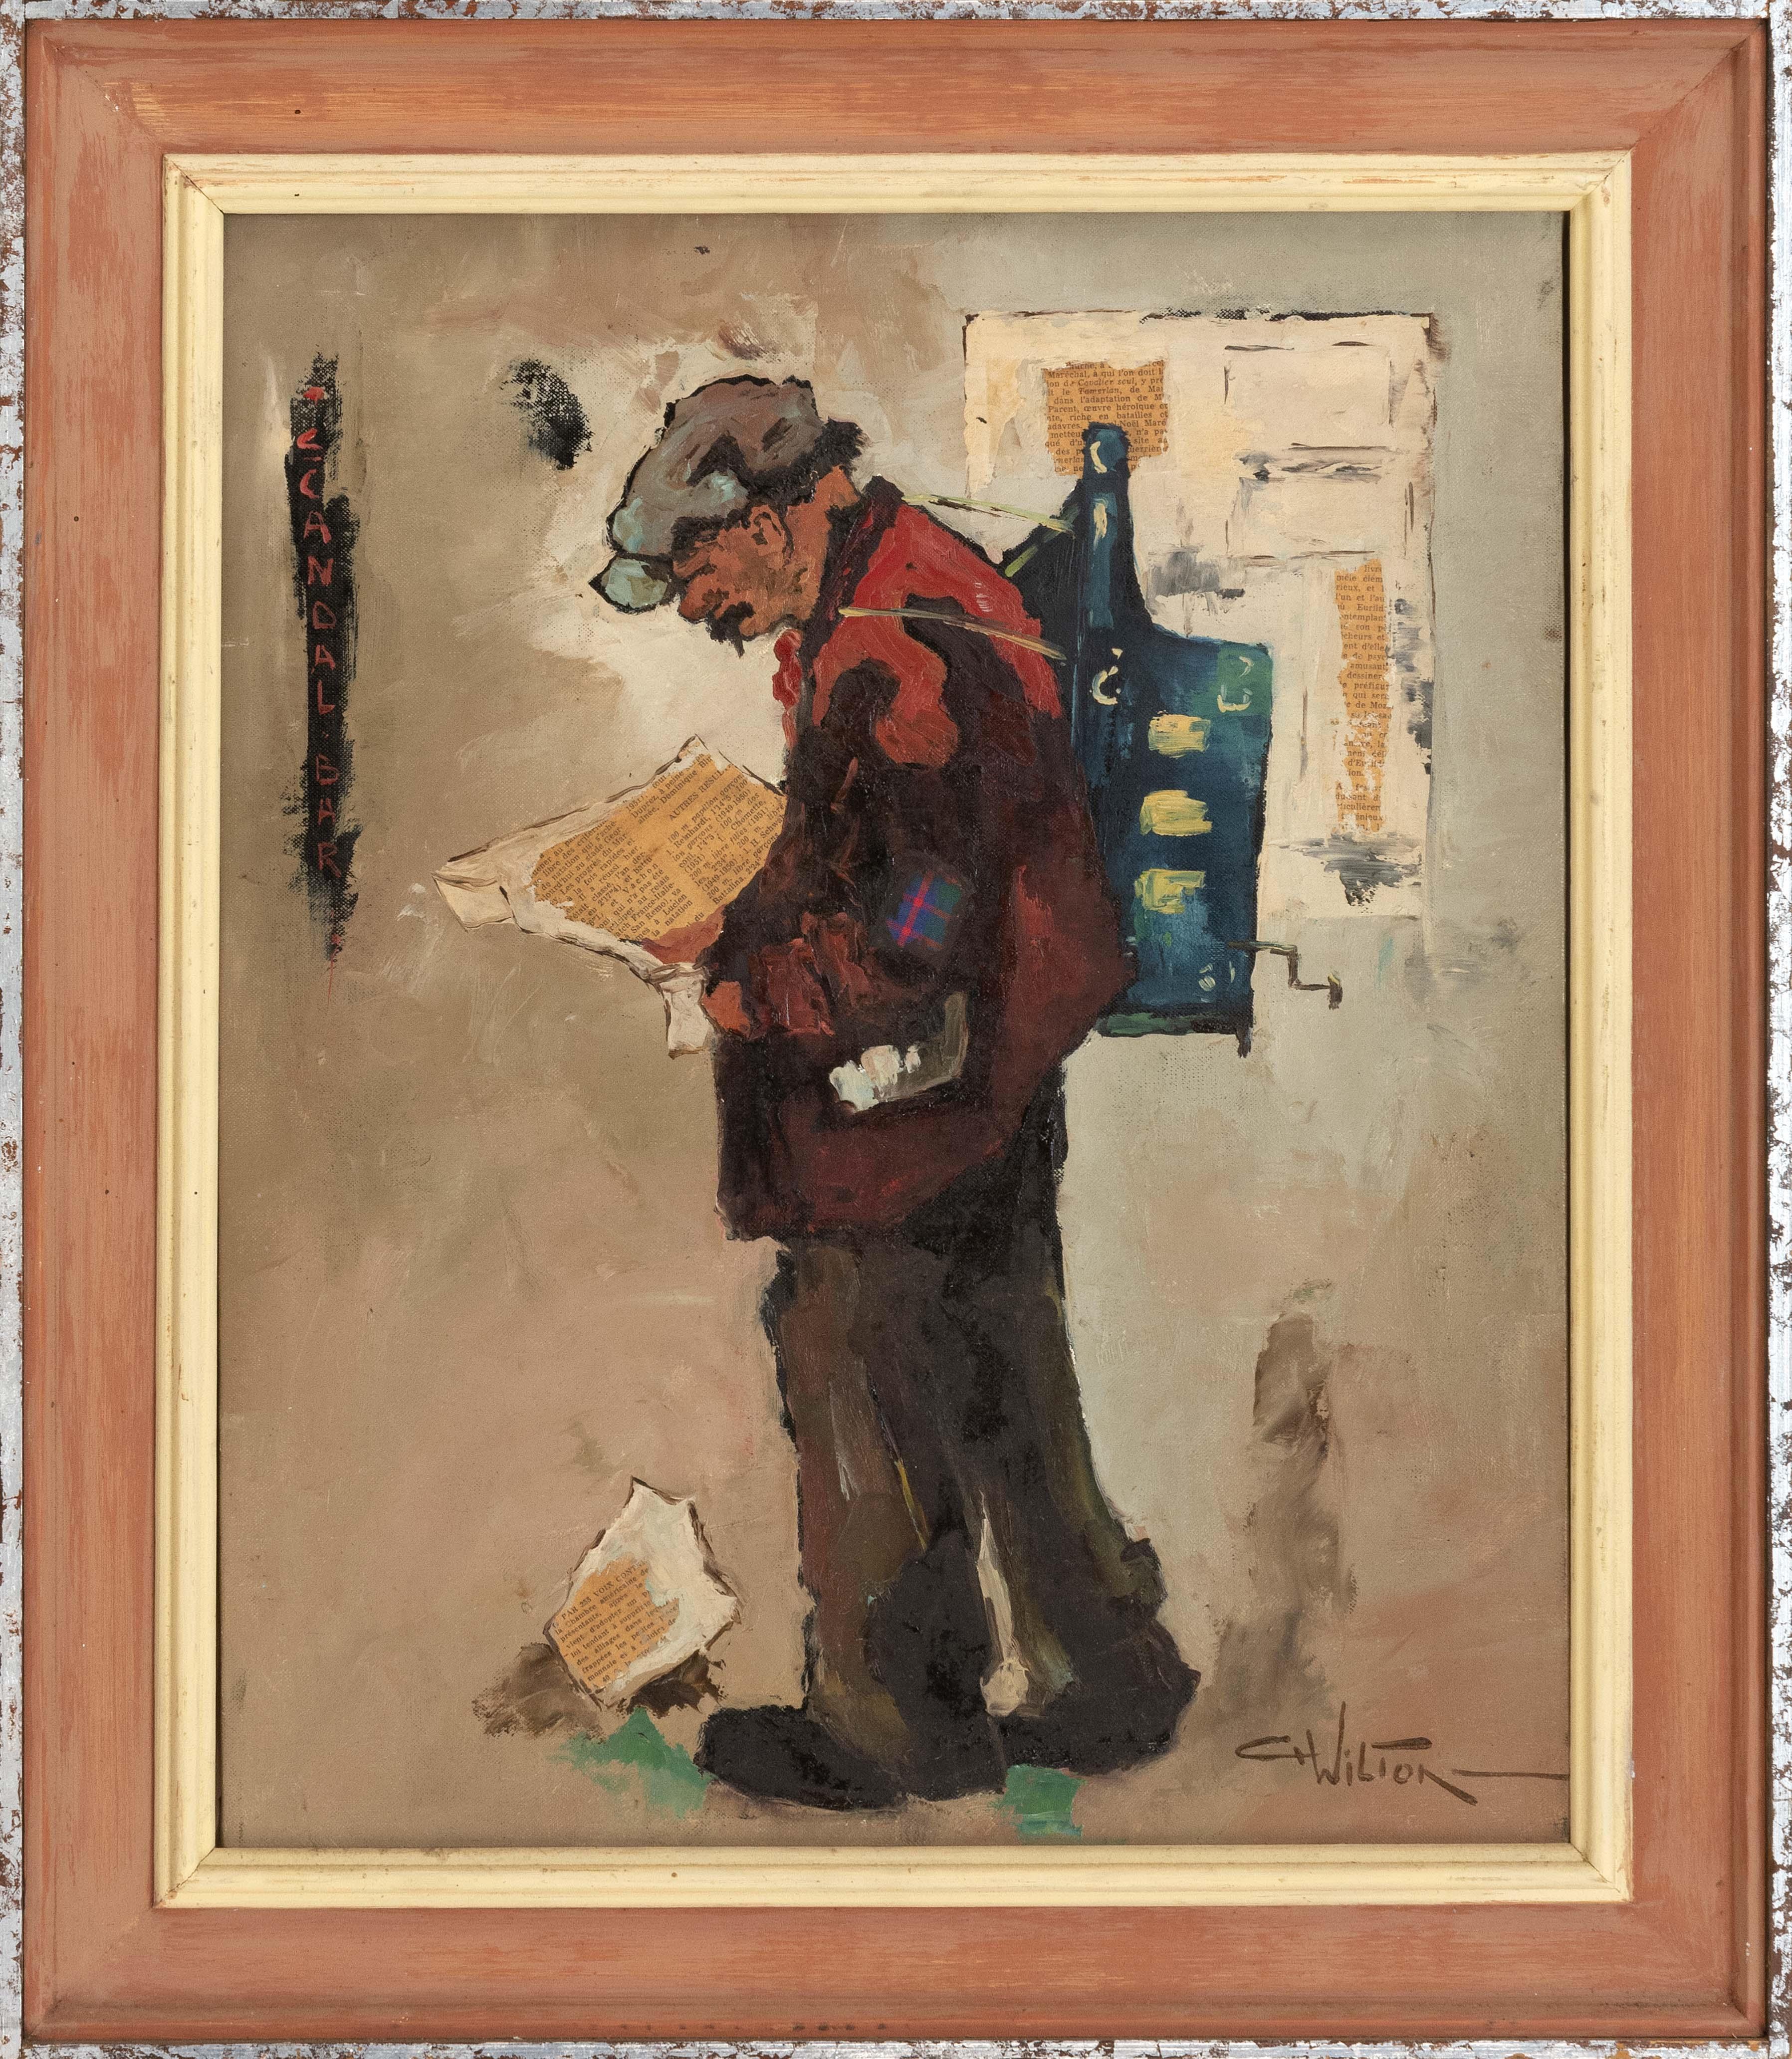 Wilton C H Man Reading A French Newspaper Mutualart